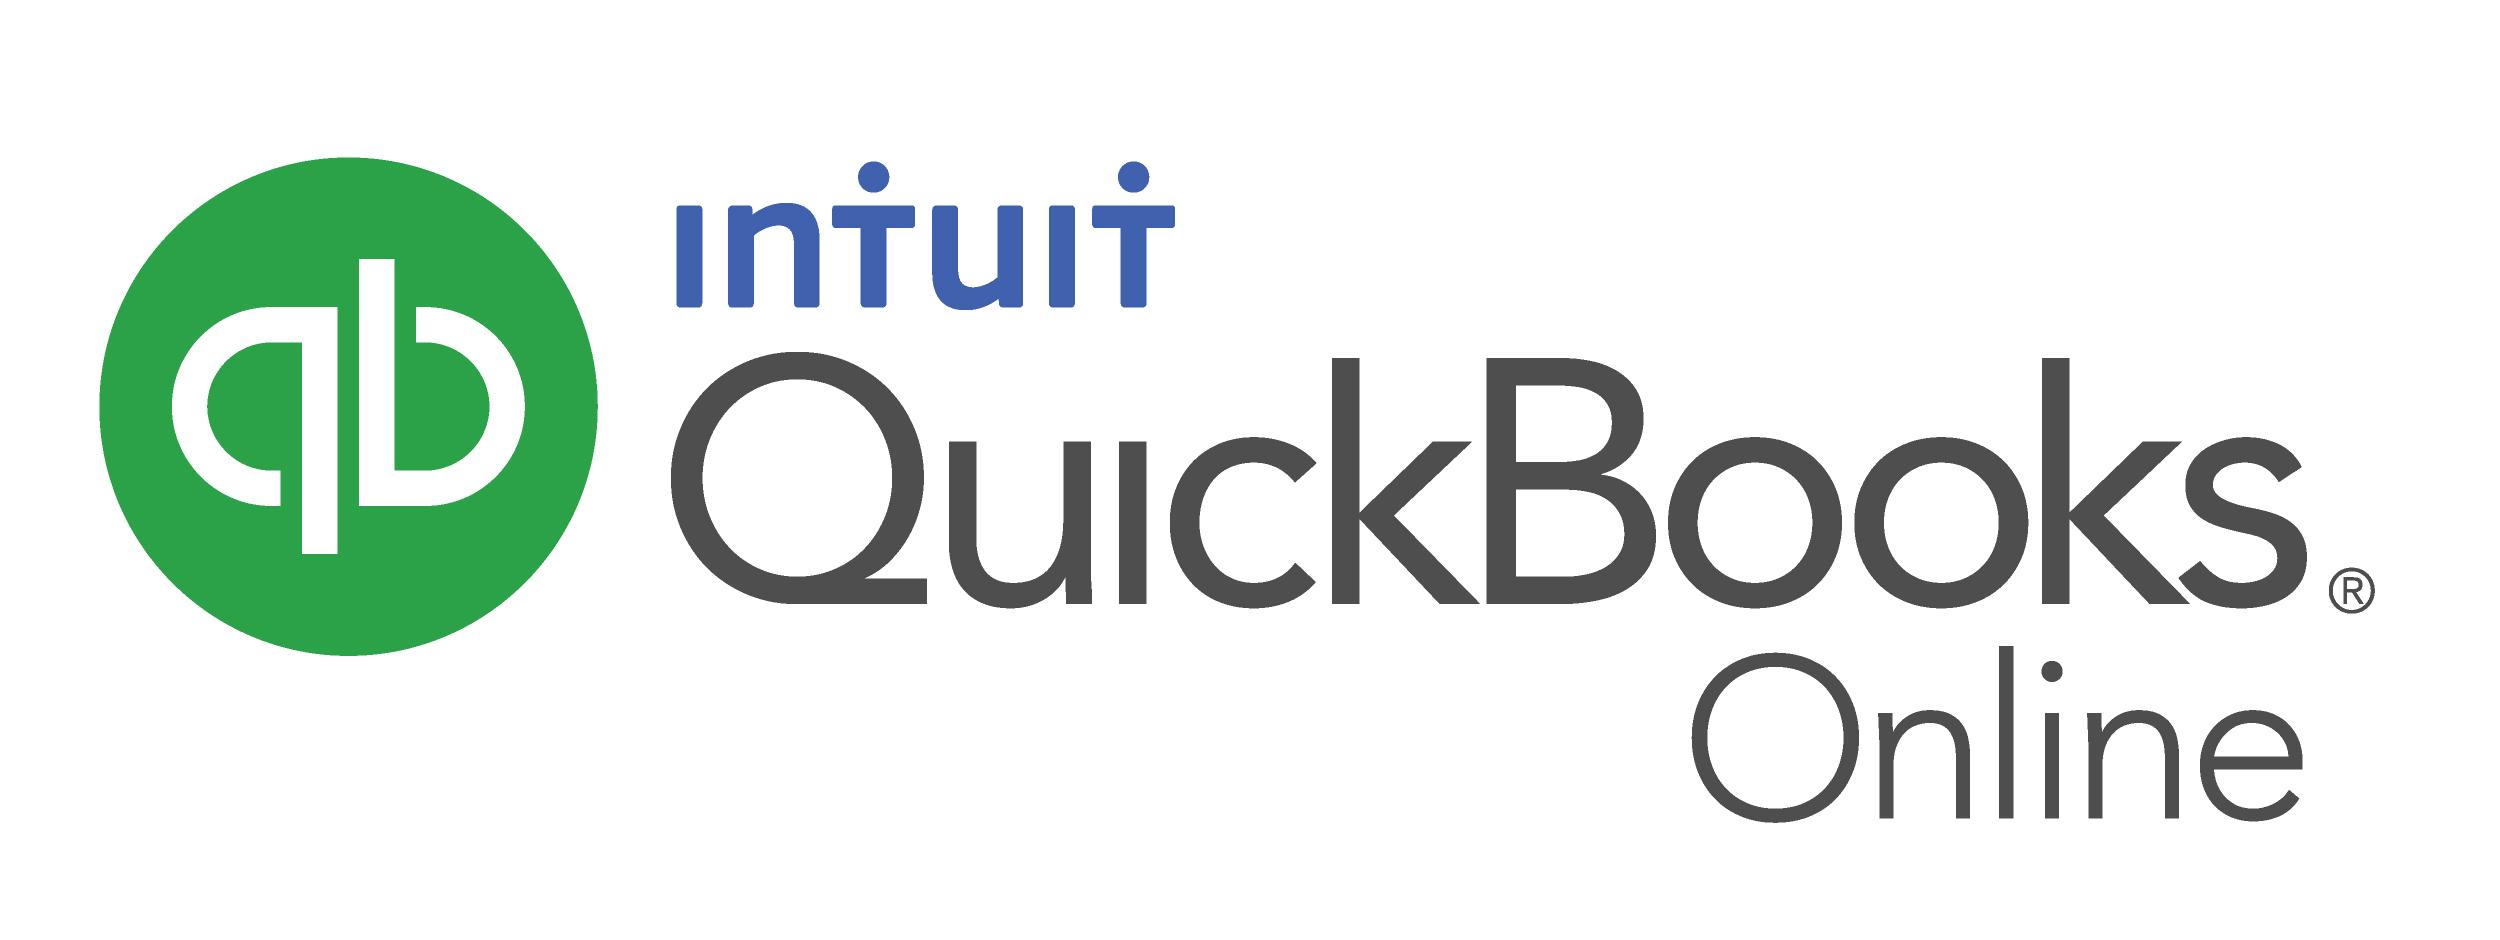 Quickbooks Online Certification 2018 Survey